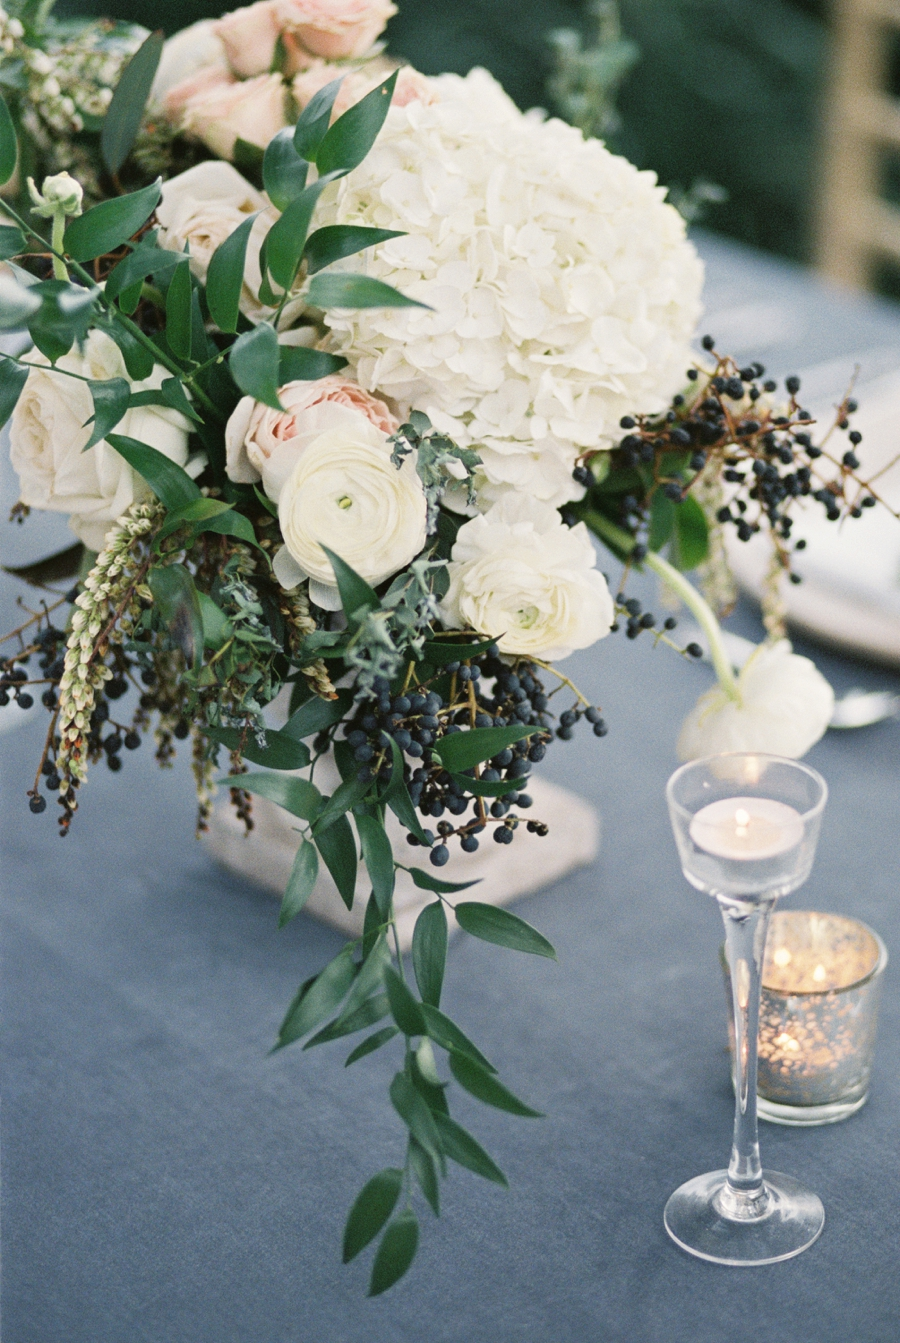 Romantic European Inspired Wedding Ideas Every Last Detail